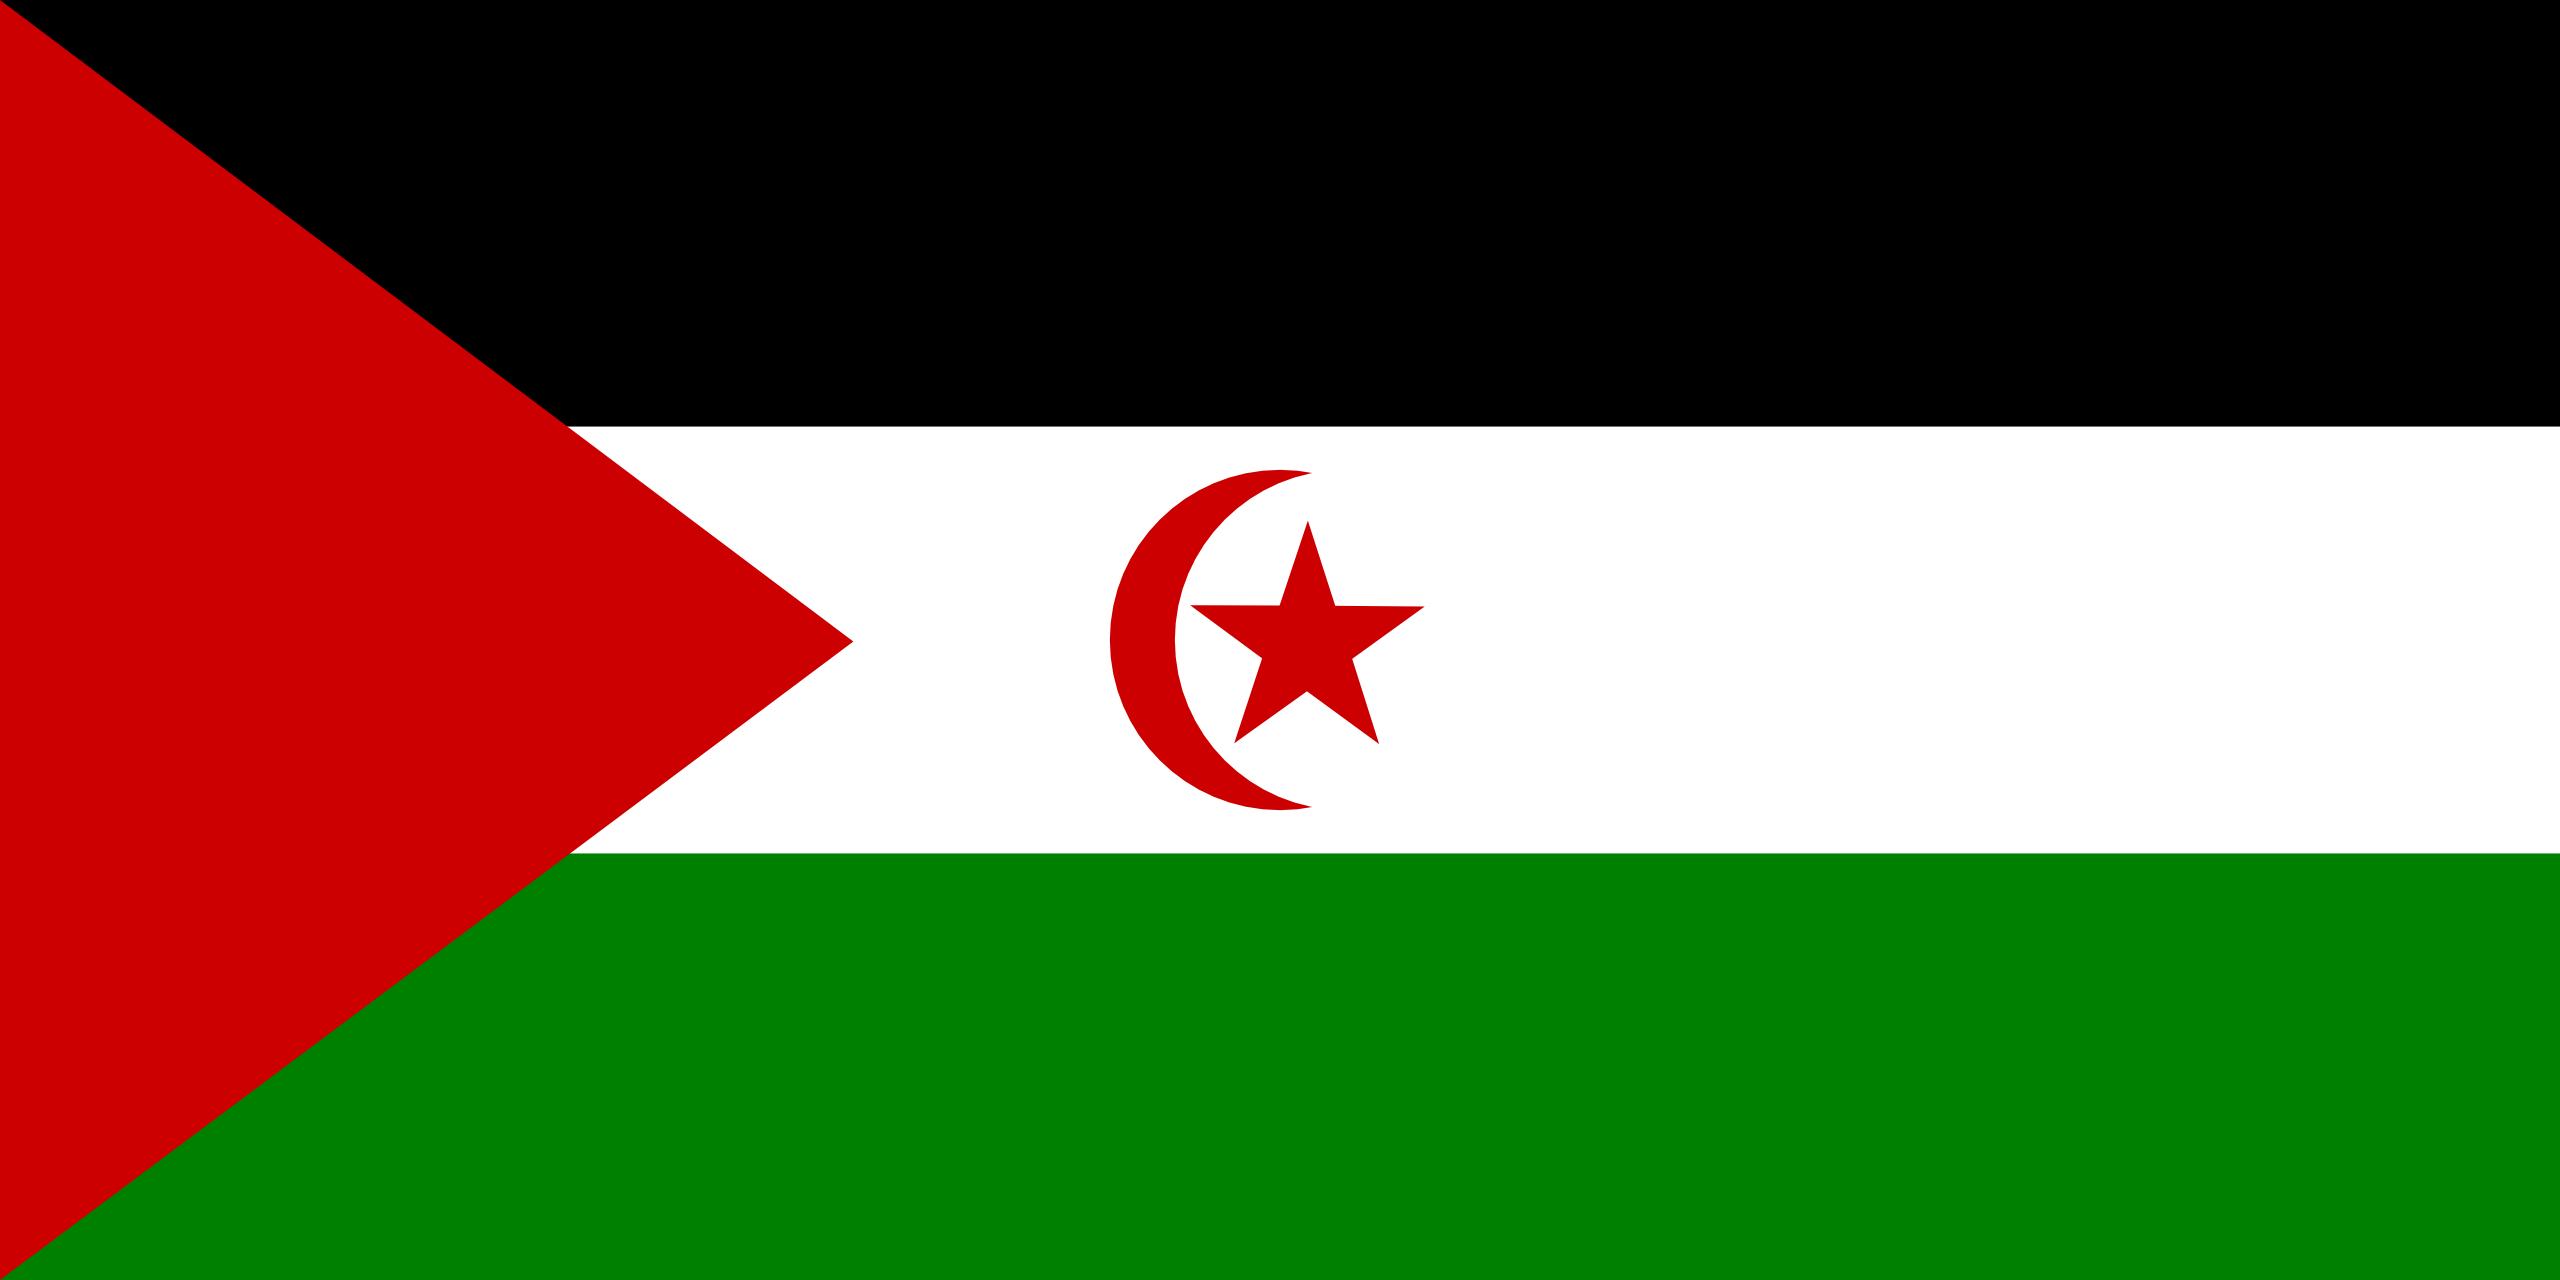 sahara occidental, país, emblema, insignia, σύμβολο - Wallpapers HD - Professor-falken.com